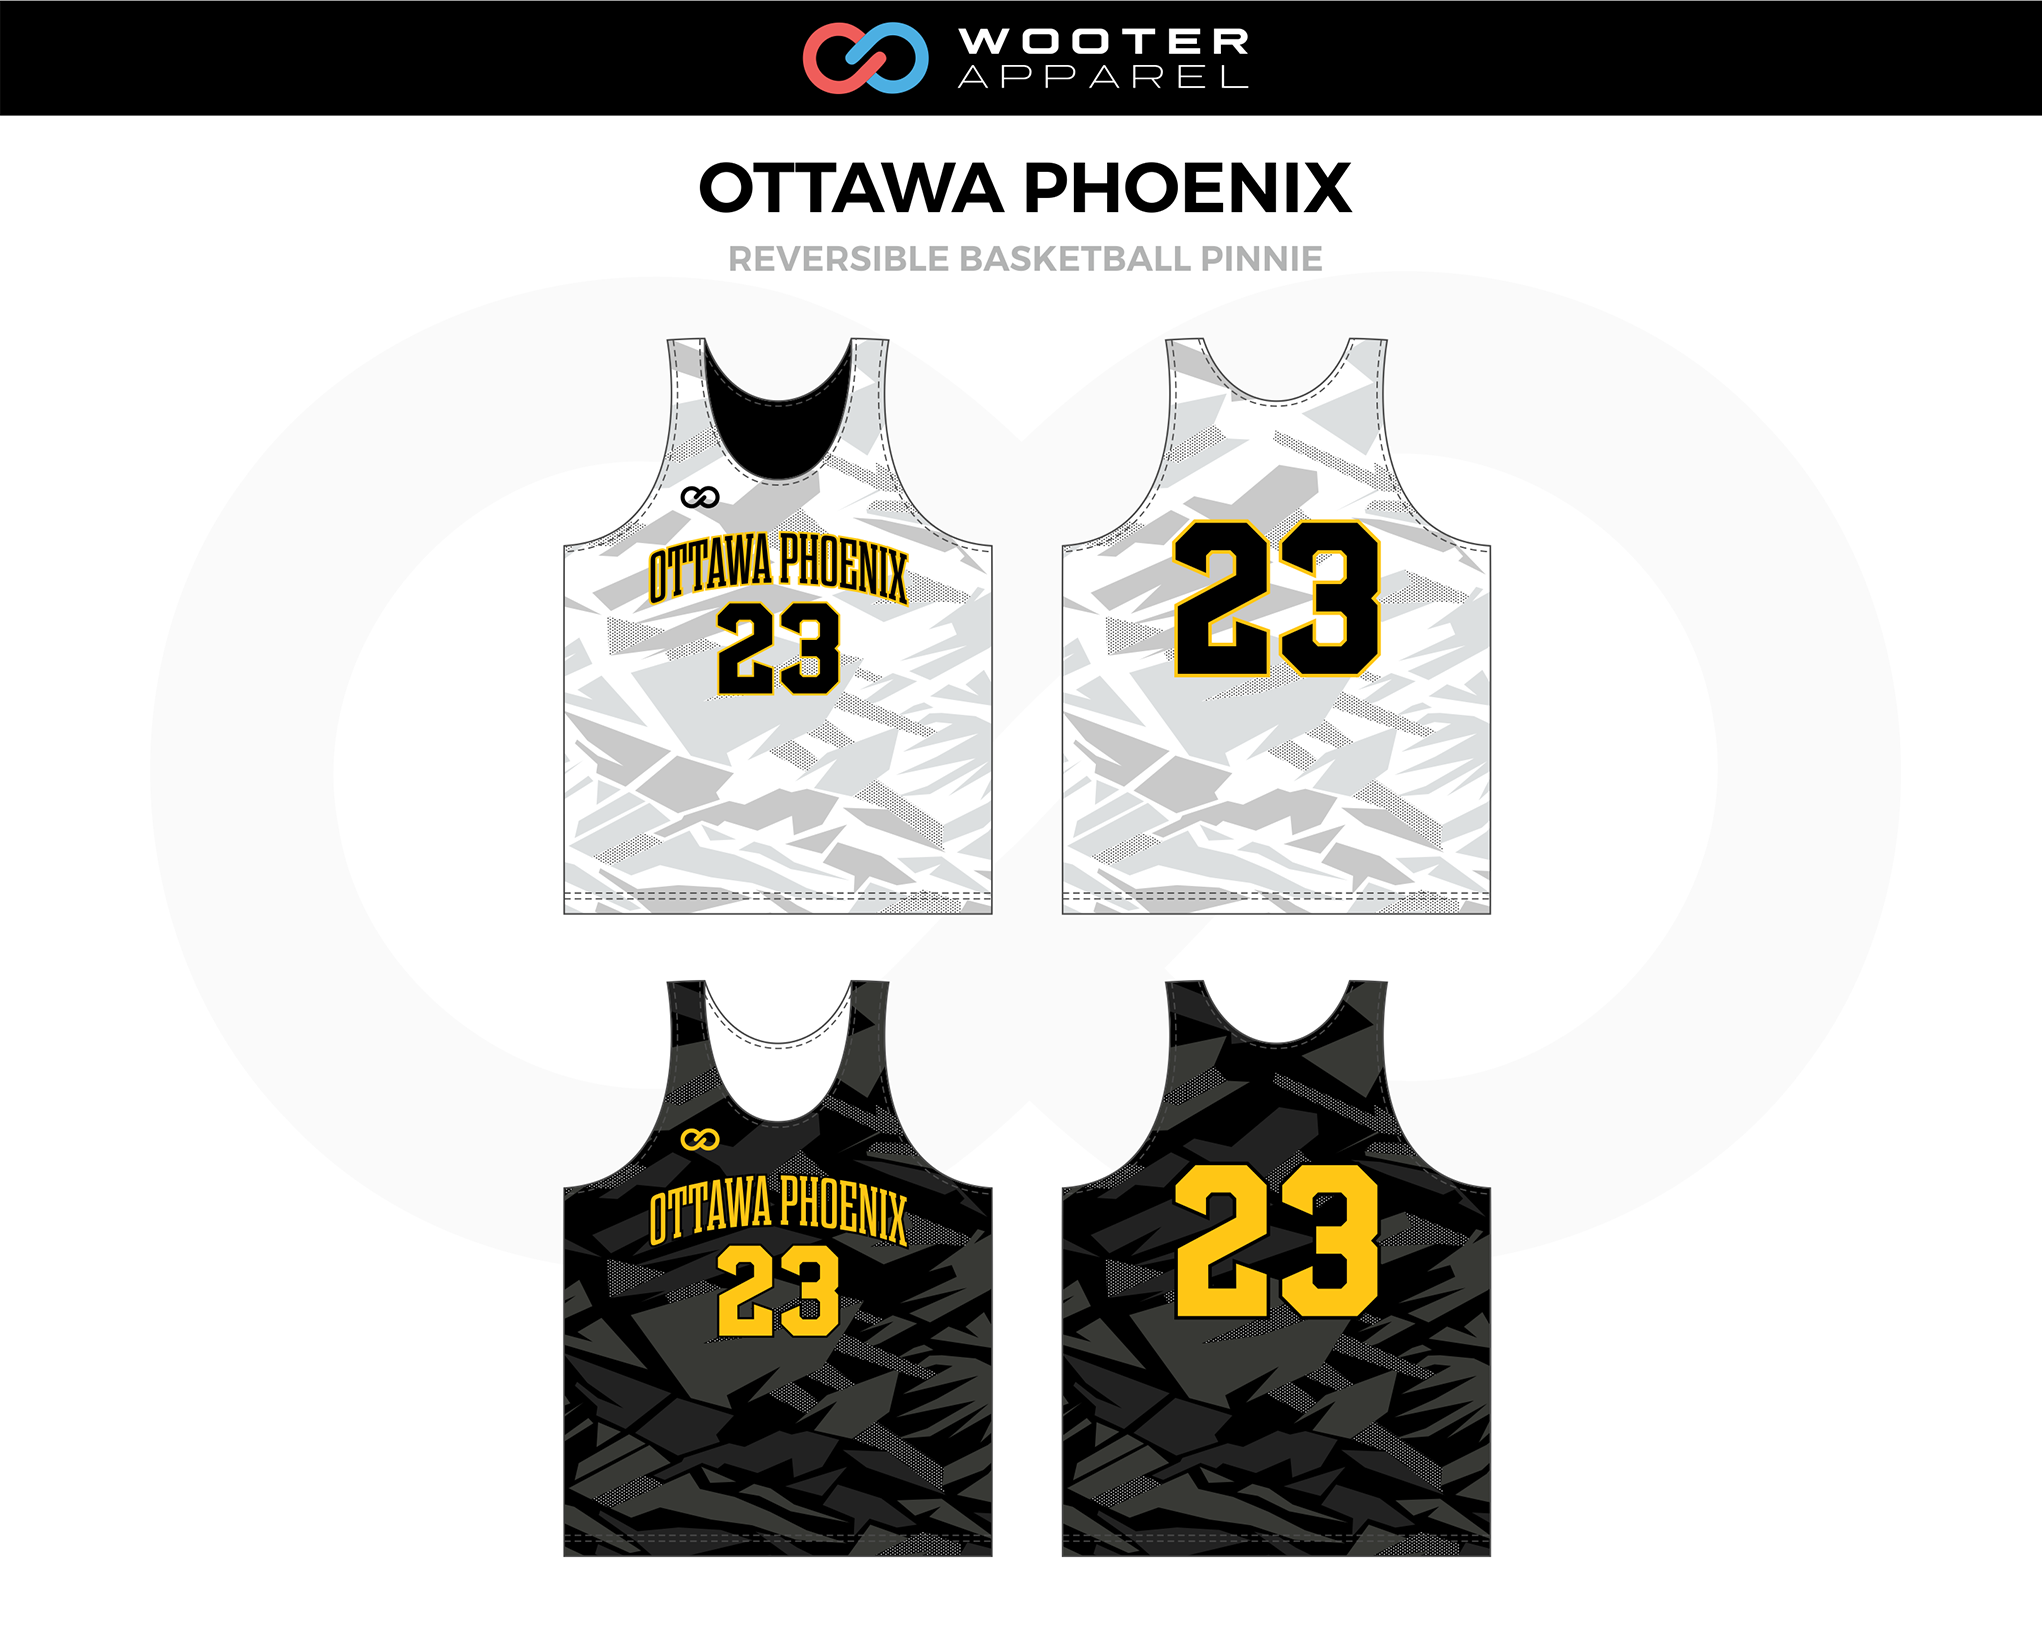 OTTAWA PHOENIX Black White Yellow Reversible Basketball Pinnie